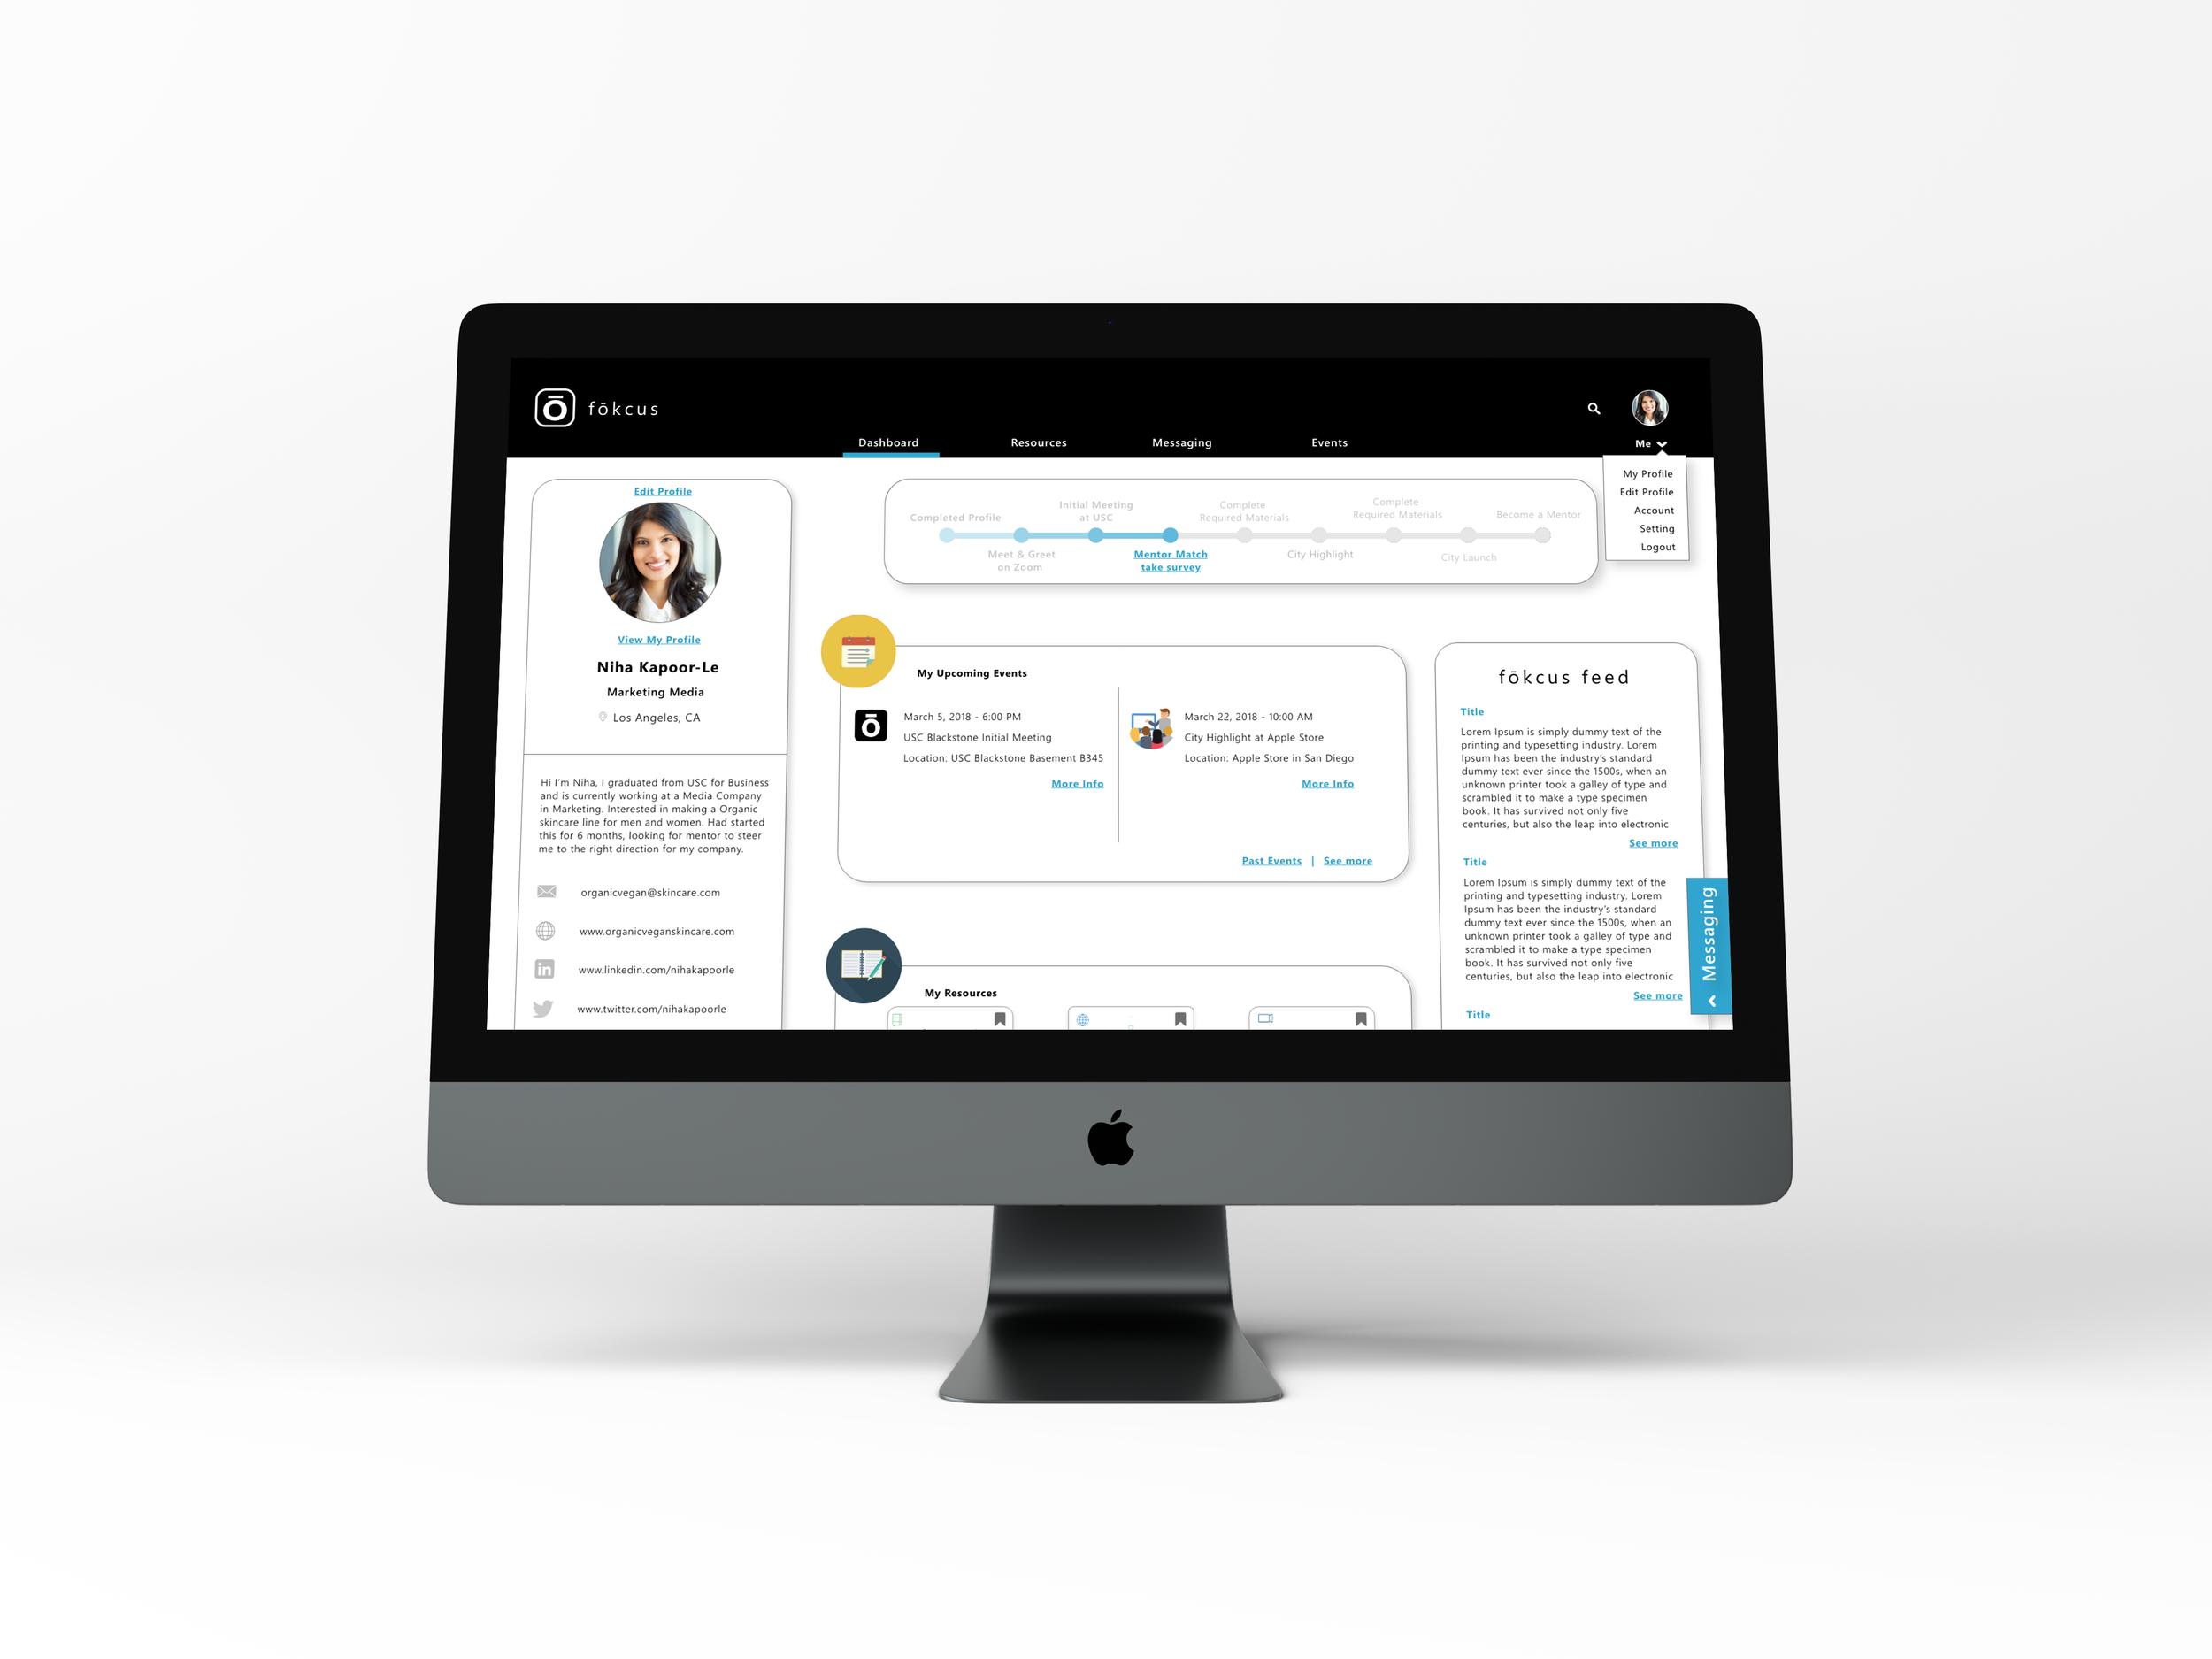 Fokcus - Web App Redesign & Service Design